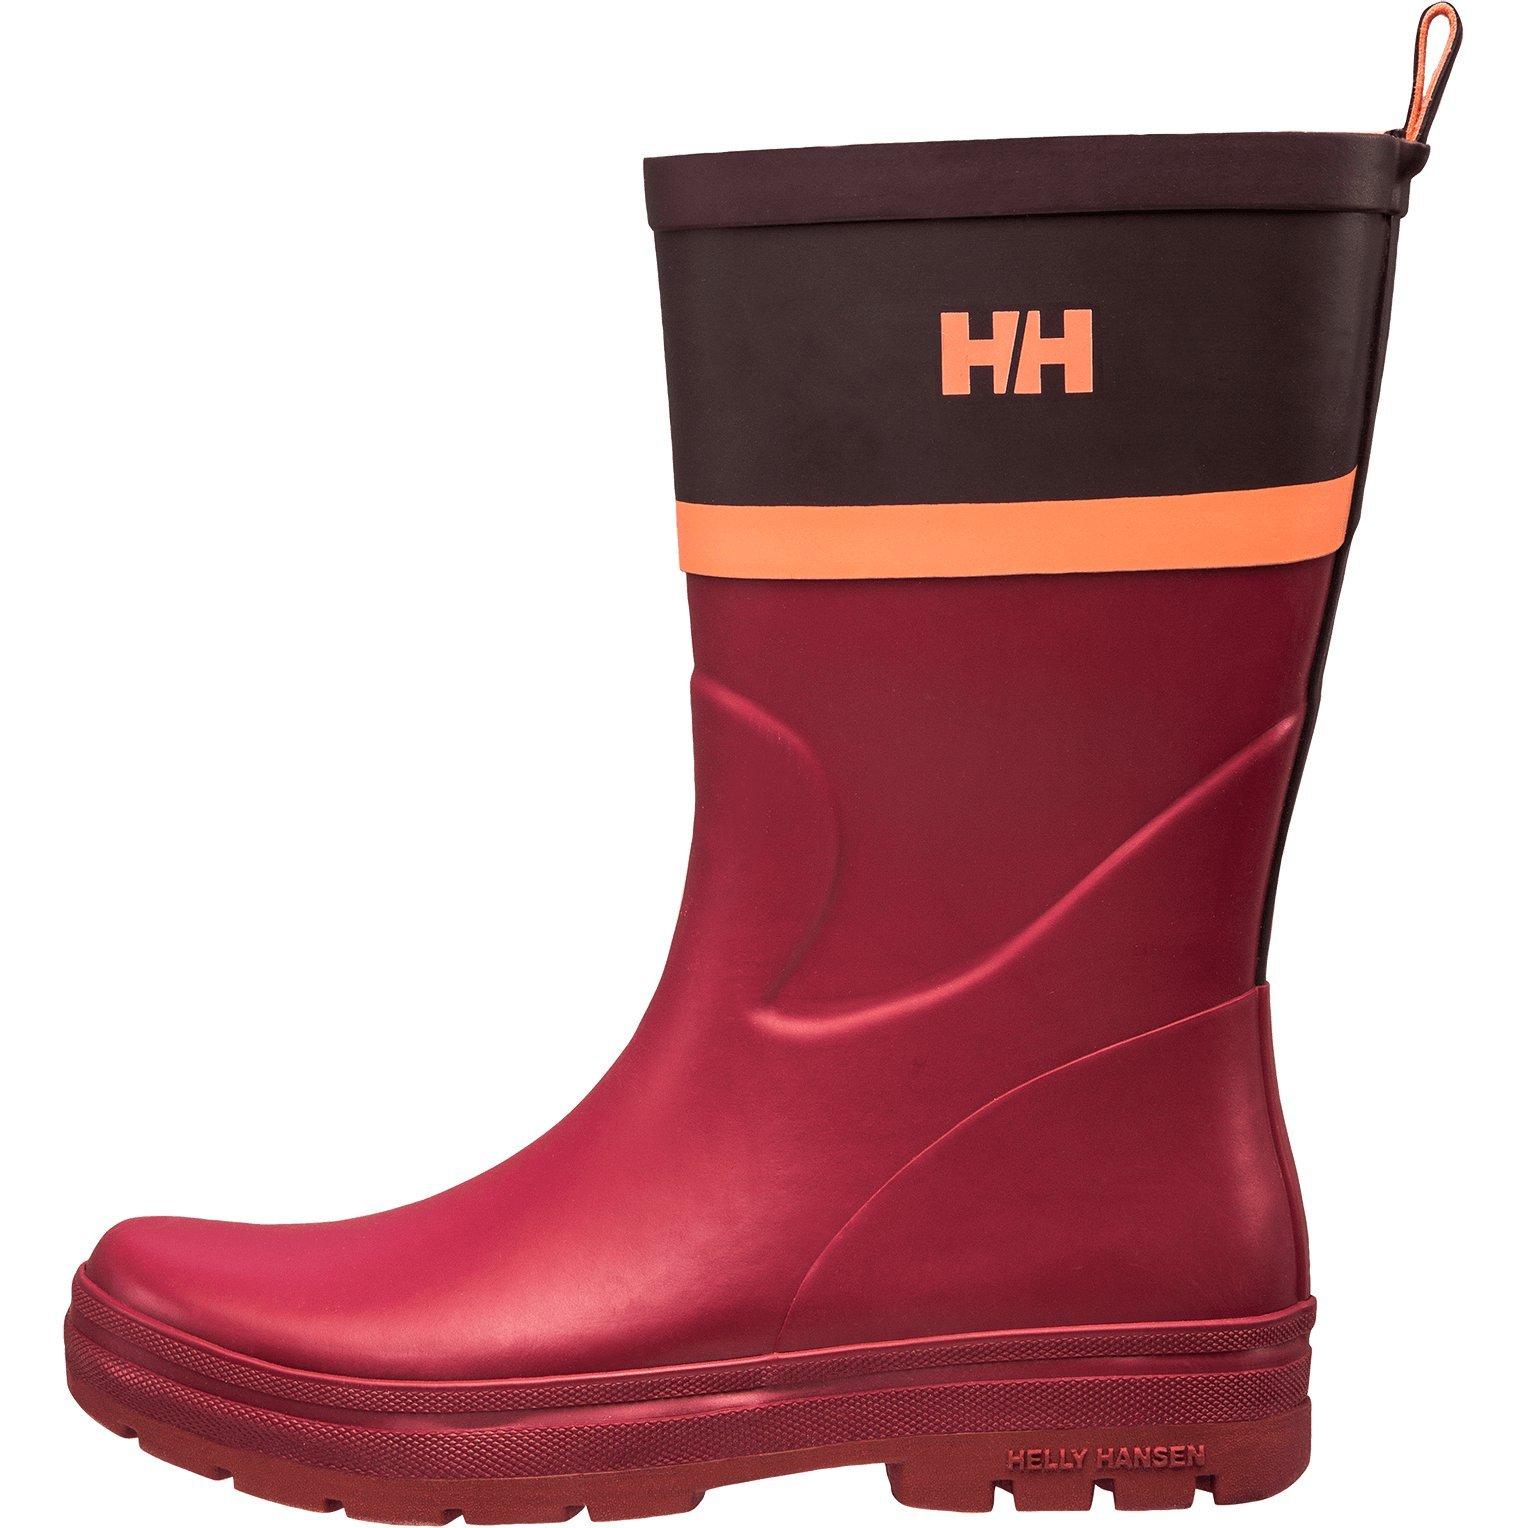 Helly Hansen Womens Waterproof Midsund 2 Graphic Rain Boots, Plum/Wild Rose/Shell Pink (Matte), 8